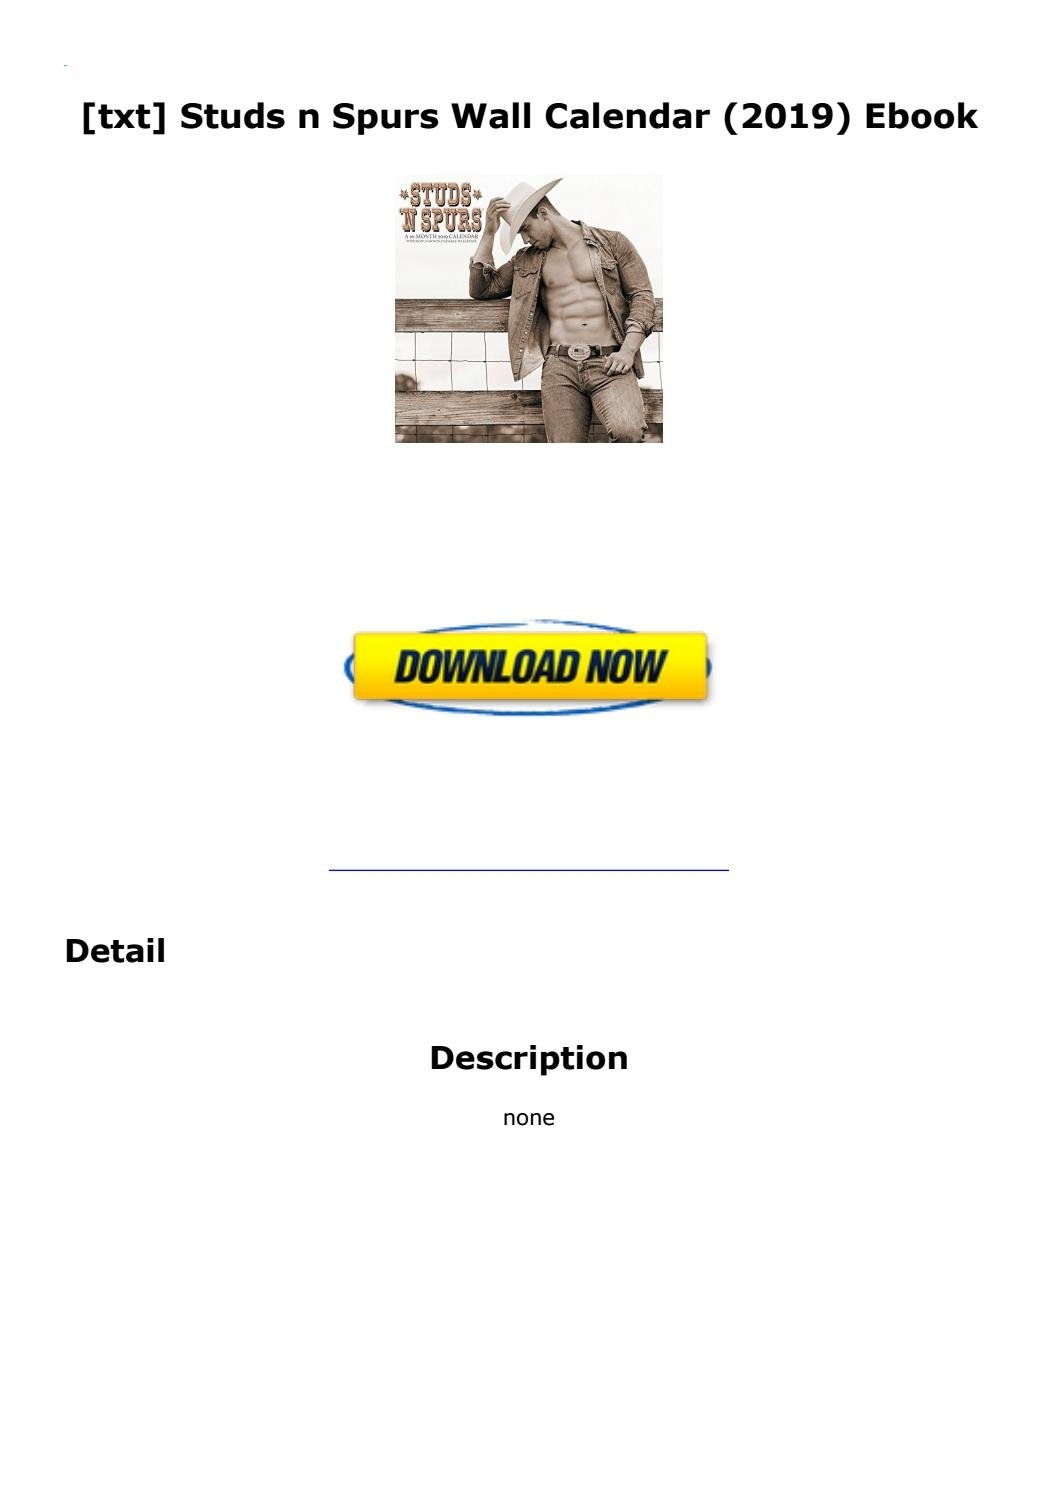 Txt] Studs N Spurs Wall Calendar (2019) Ebookemlpro437 – Issuu Studs N Spurs Calendar 2019